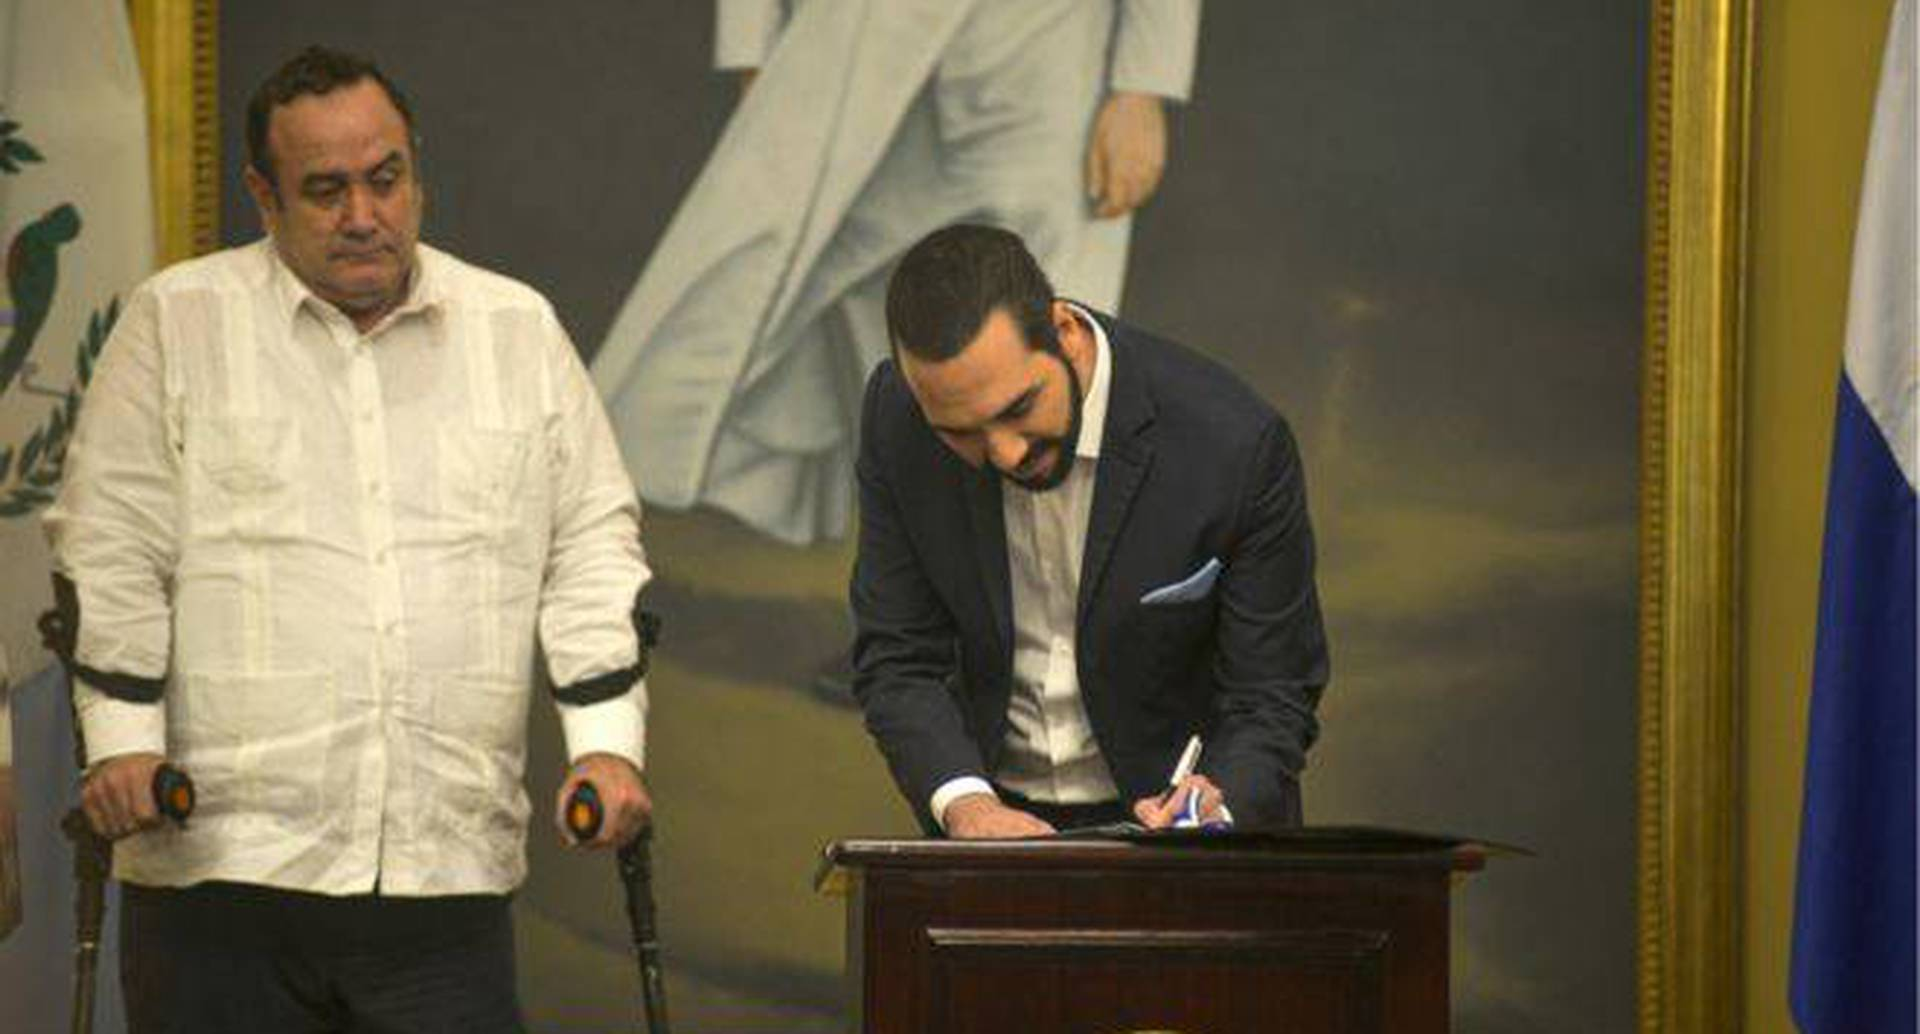 Alejandro Giammattei y Nayib Bukele firmaron un acuerdo histórico. Foto: Getty Images